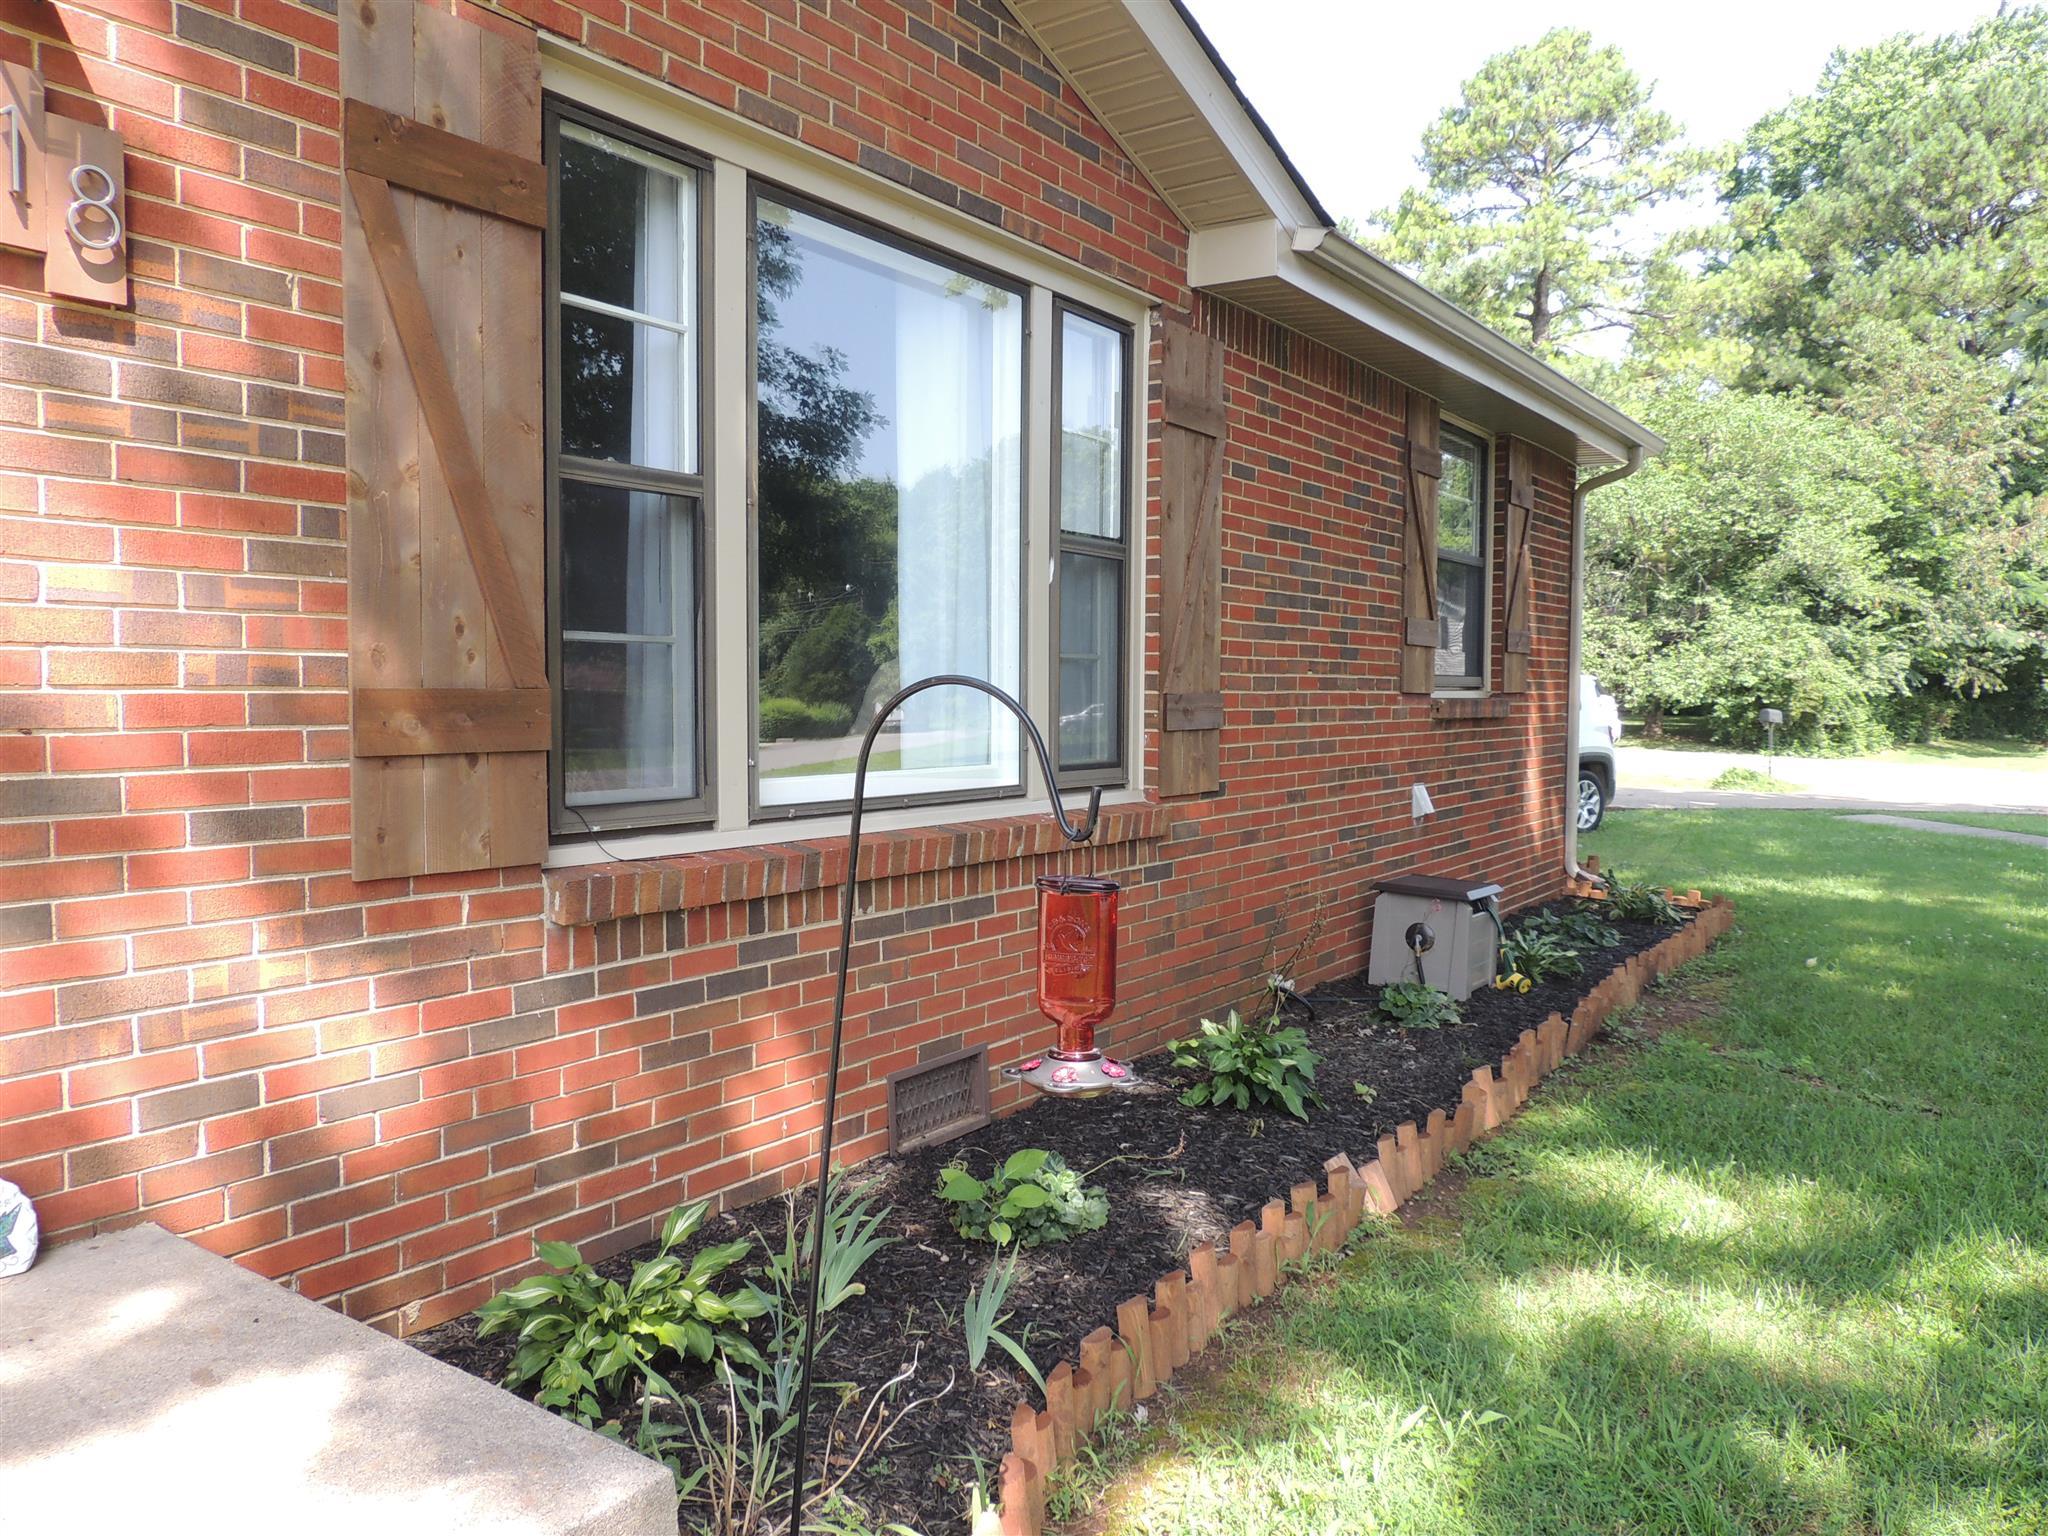 318 Notgrass Rd, Clarksville, TN 37042 - Clarksville, TN real estate listing